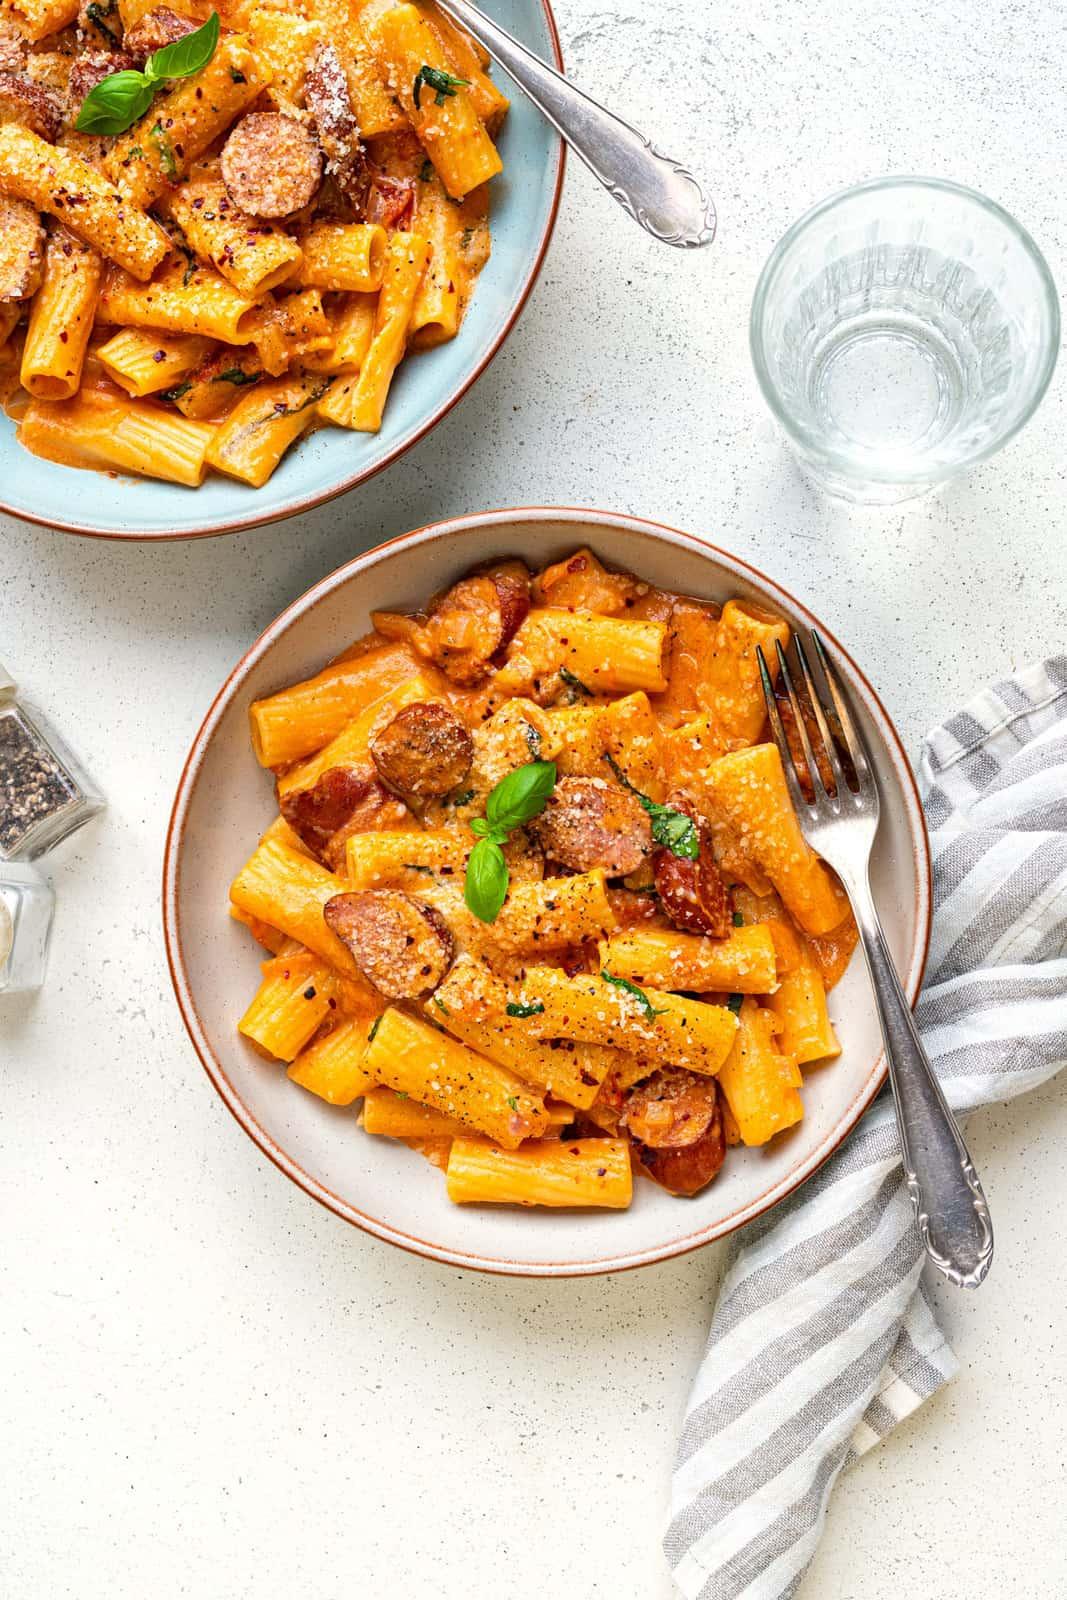 Bowl of sausage pasta in a creamy tomato mascarpone sauce